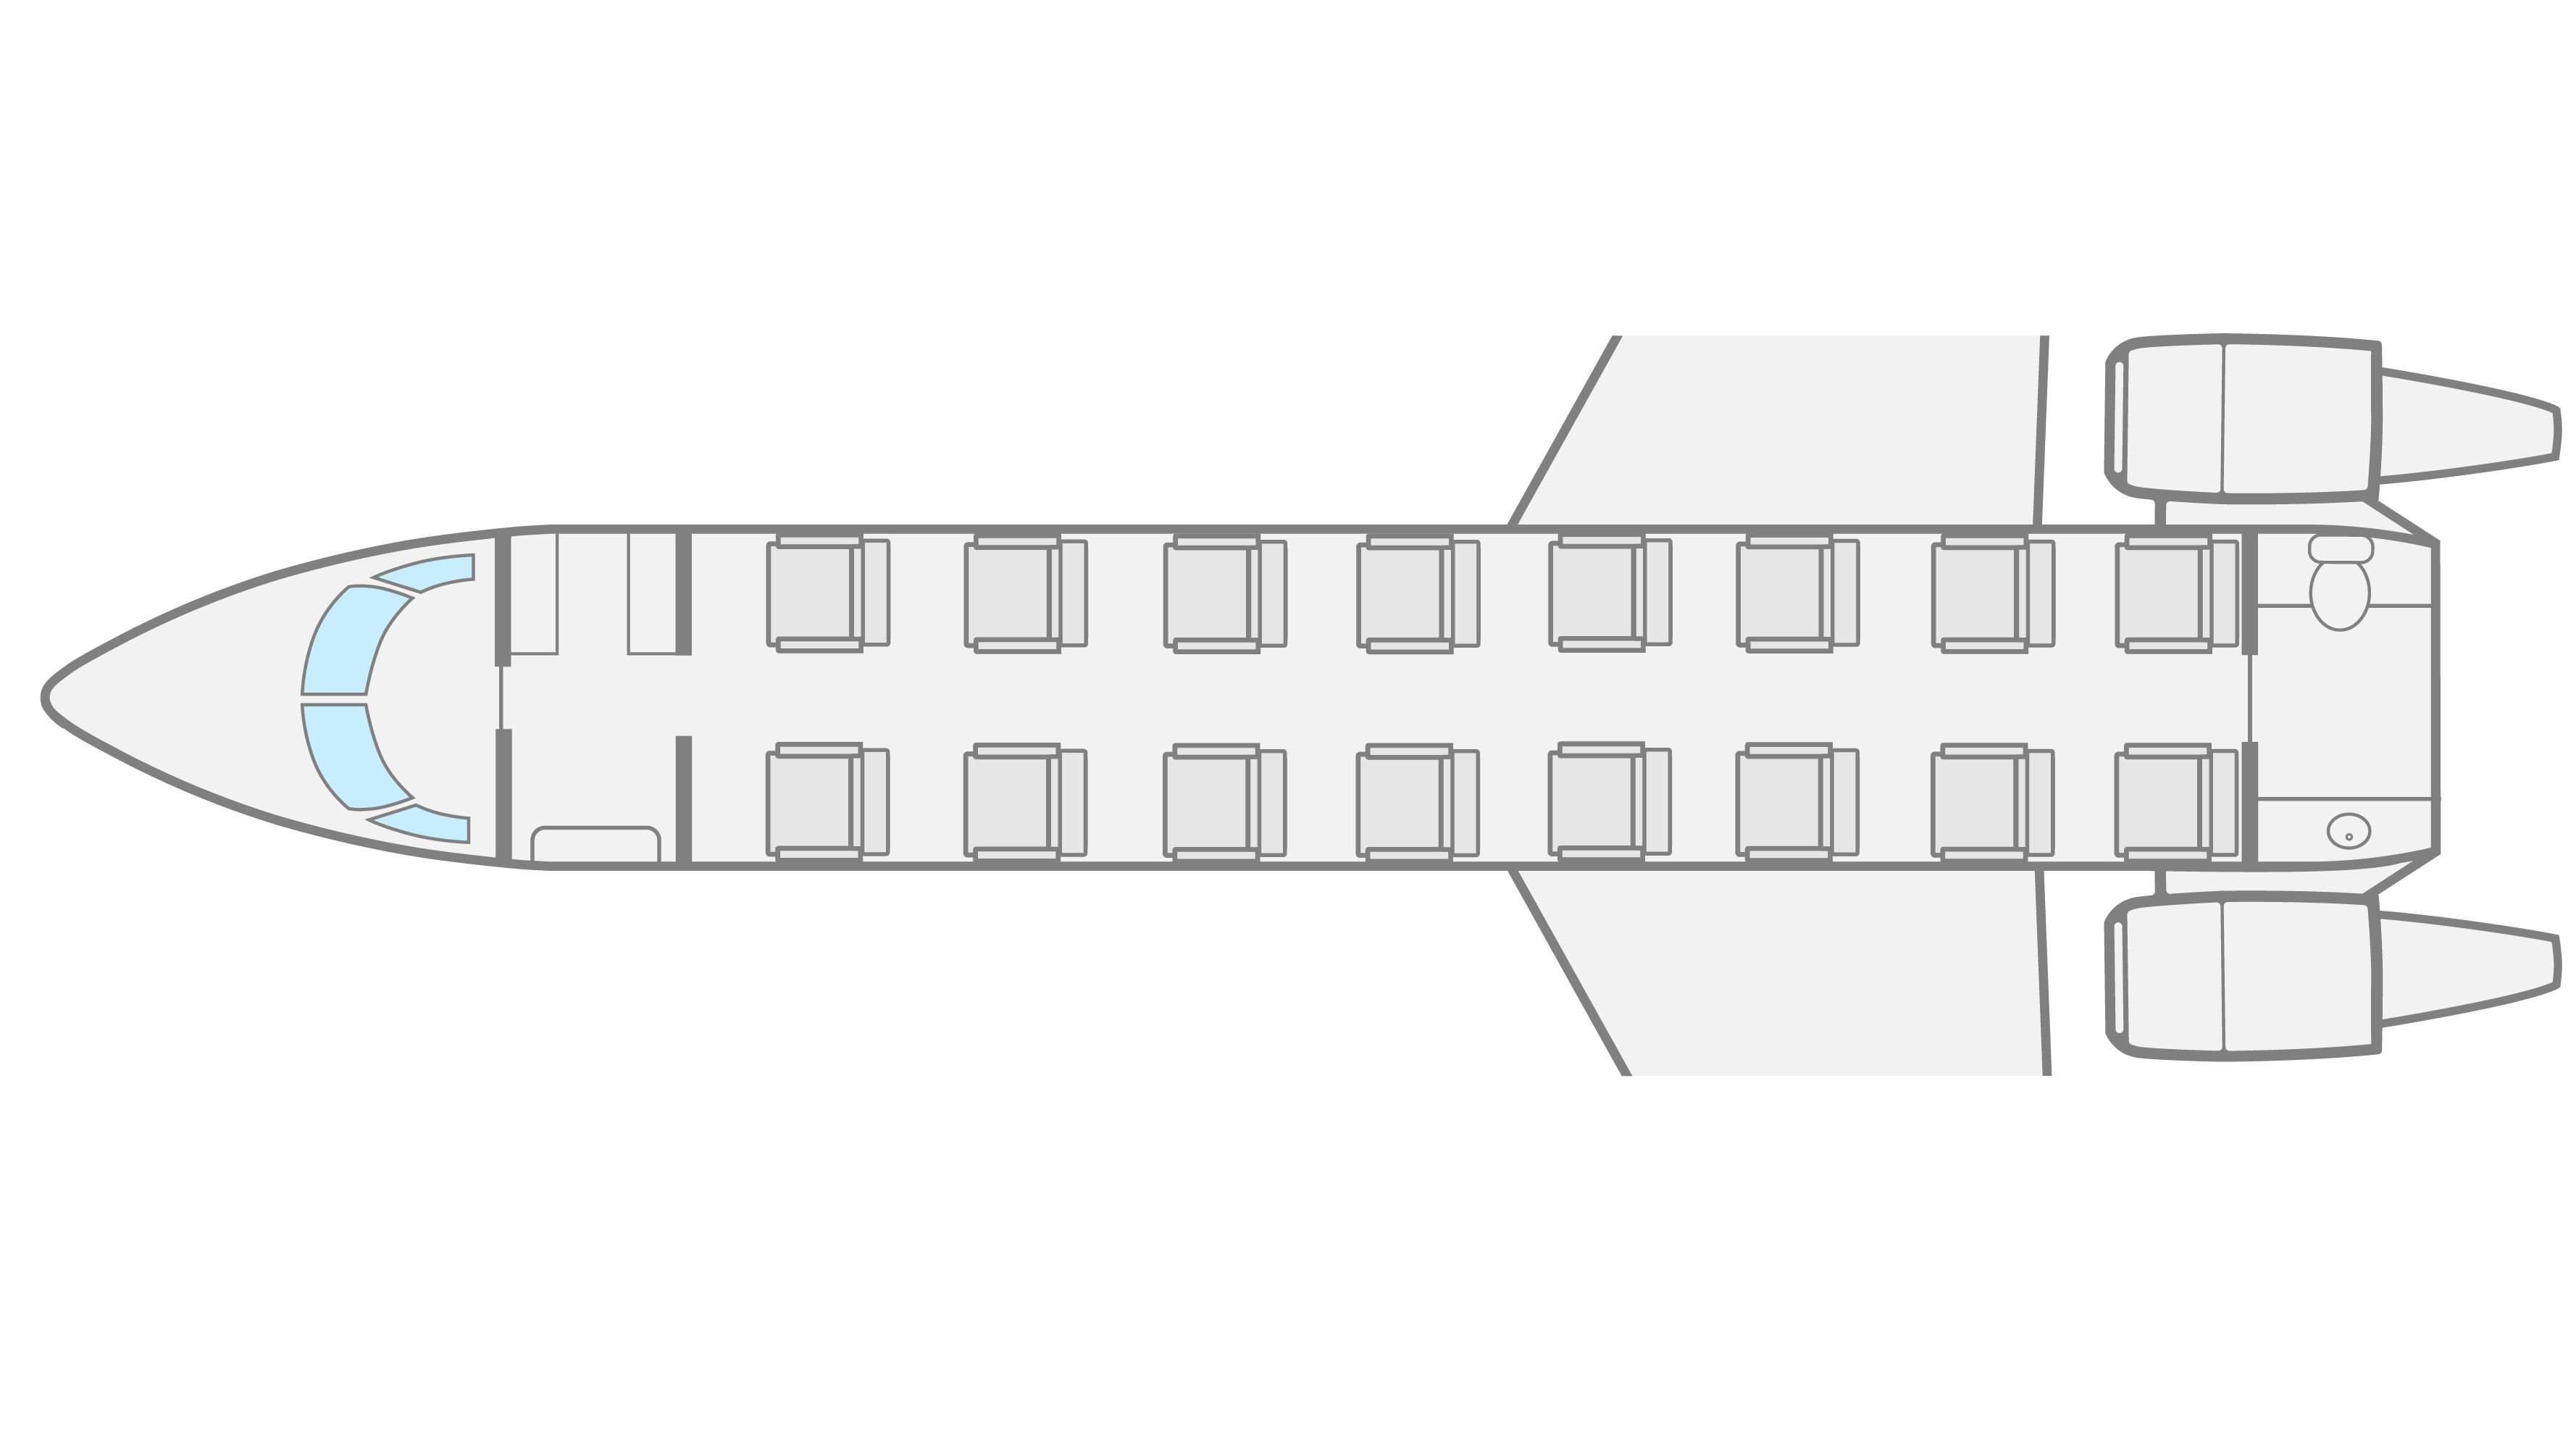 seating configuration image